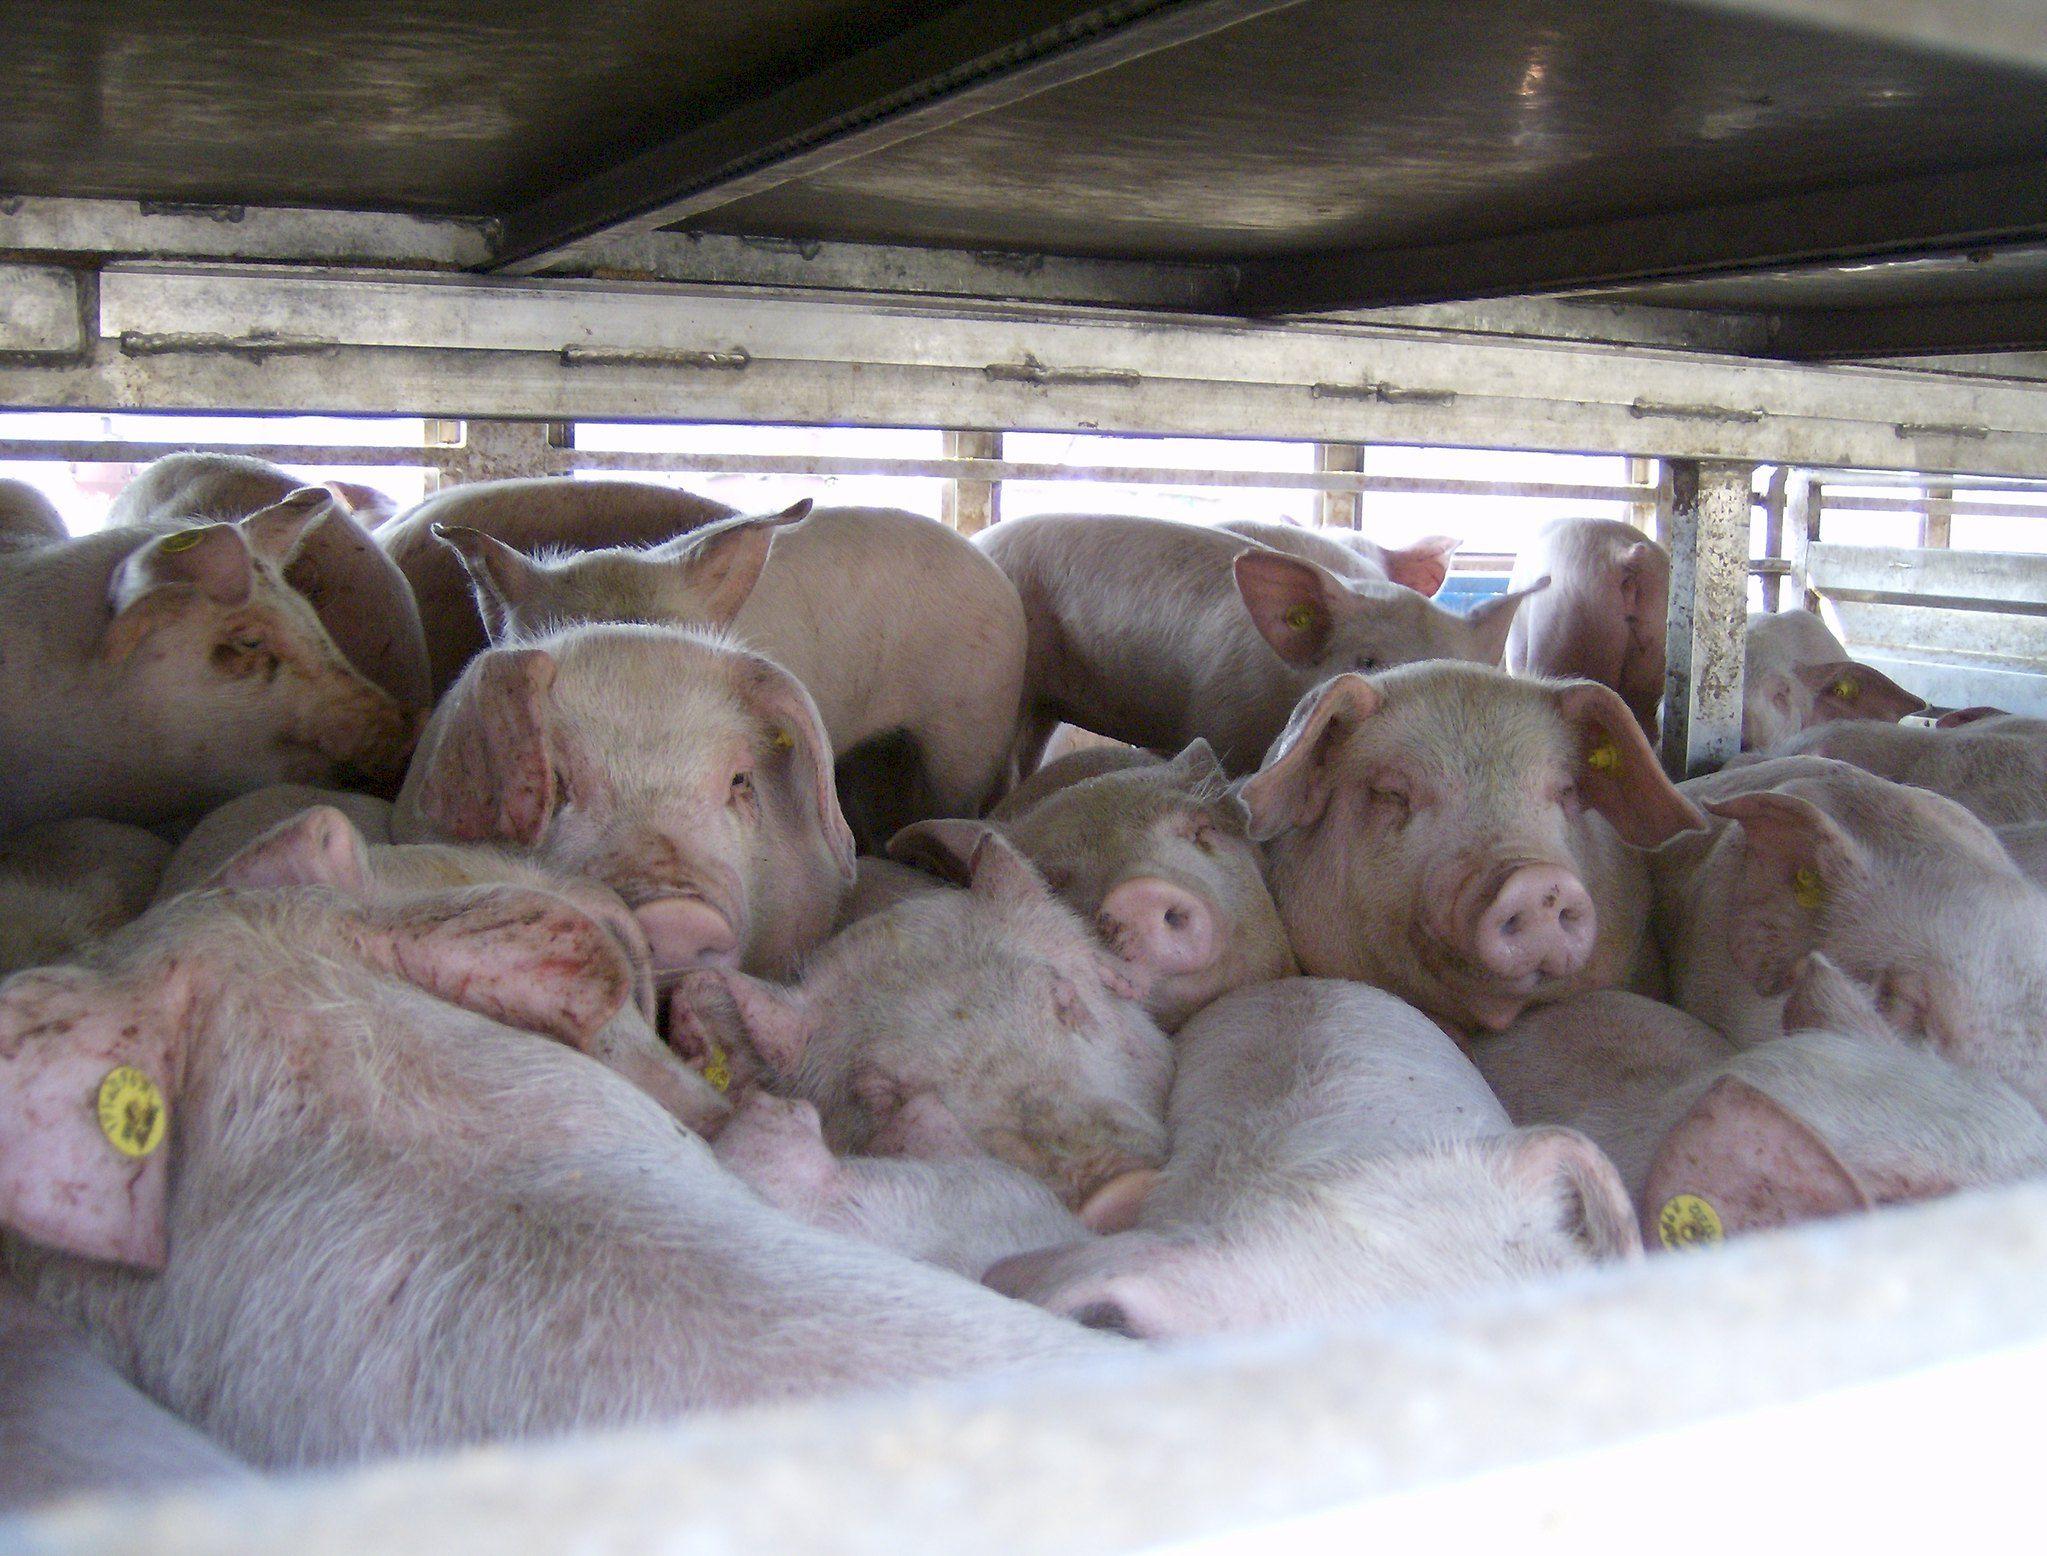 EU-Parlament für Untersuchungsausschuss zum Thema Tiertransporte